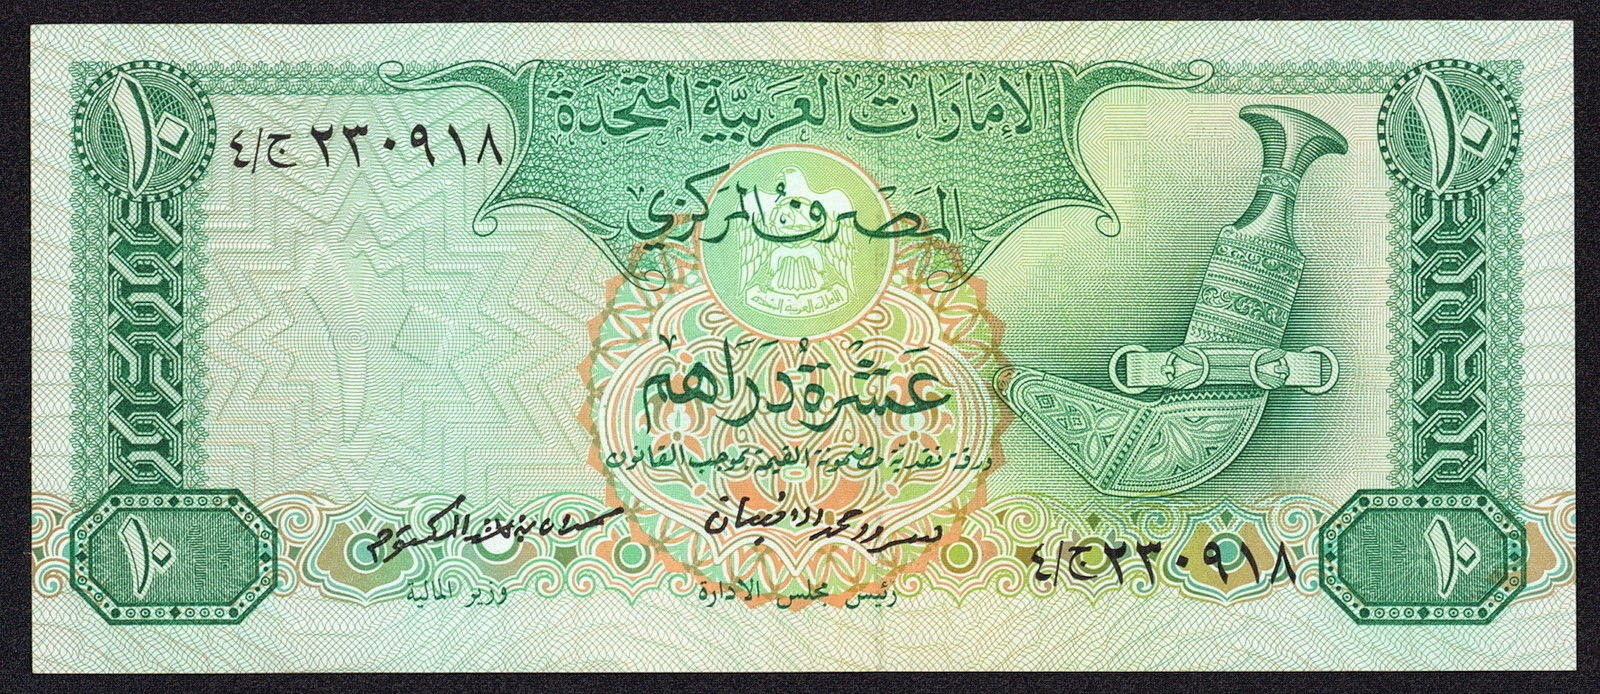 United Arab Emirates Banknotes 10 Dirham note 1982 traditional dagger Khanjar